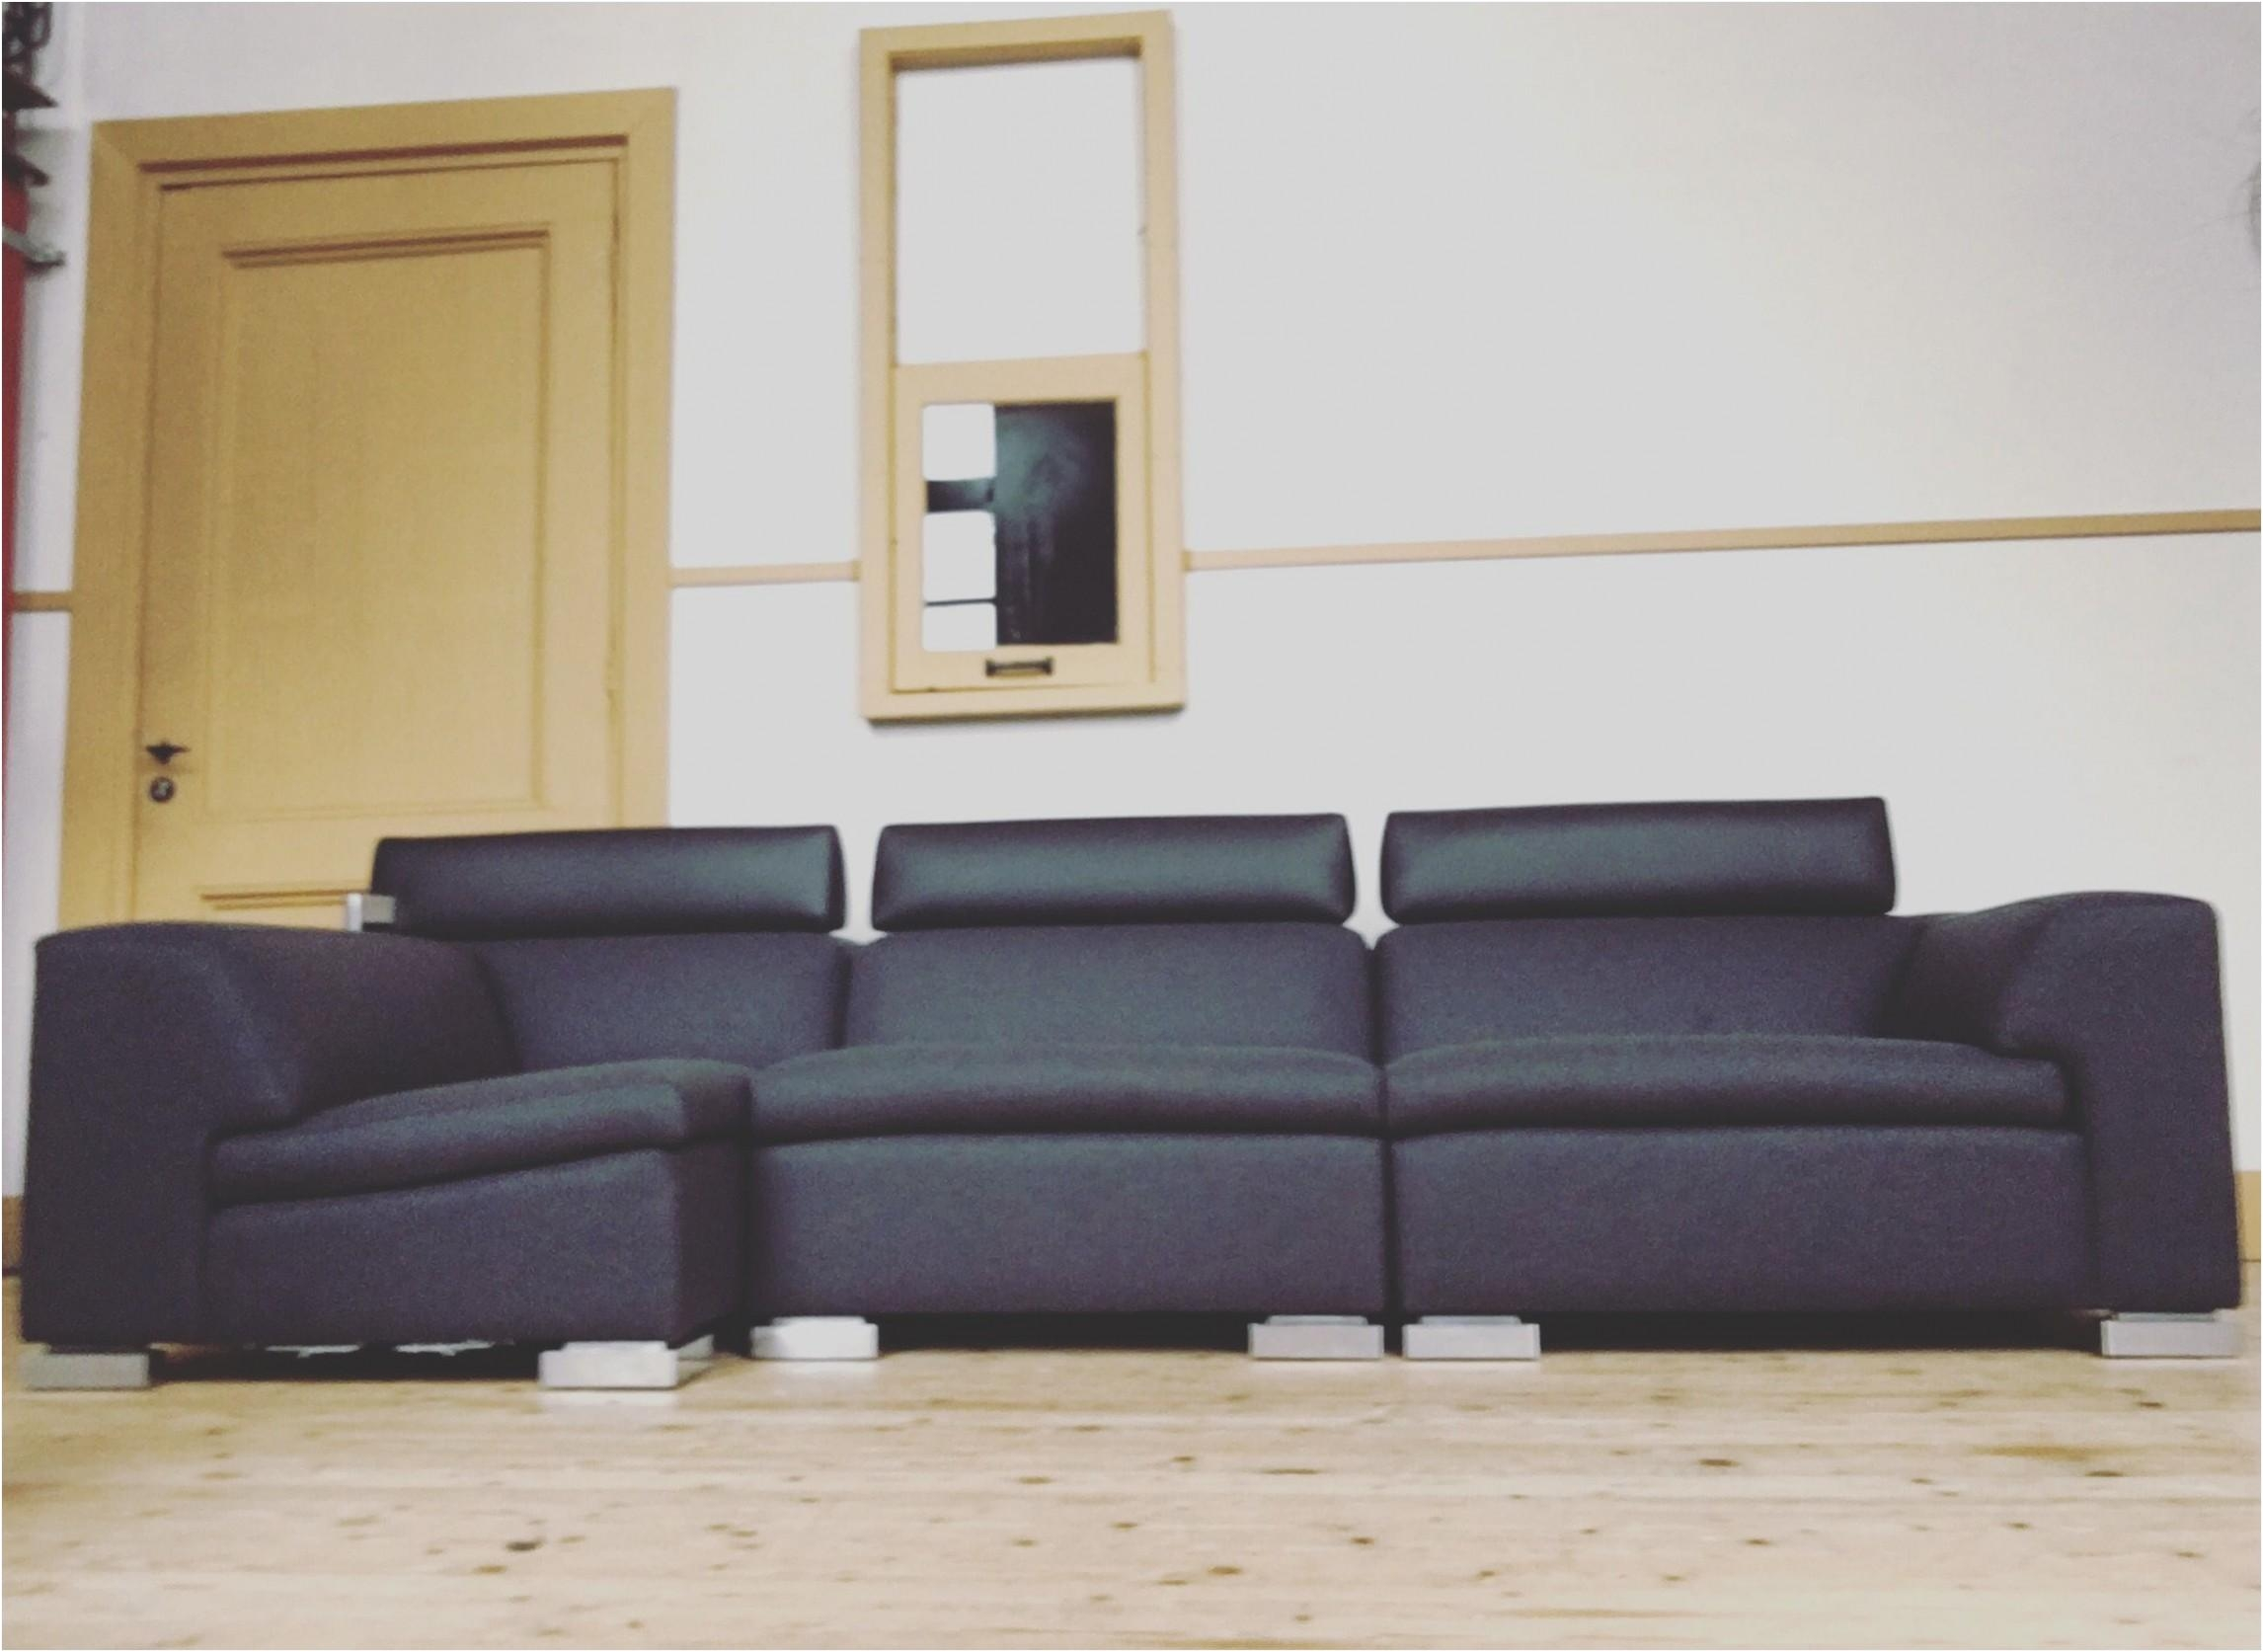 full size of furniture comforter sets at kohl s lovely kohl s memory foam mattress incredible large size of furniture comforter sets at kohl s lovely kohl s